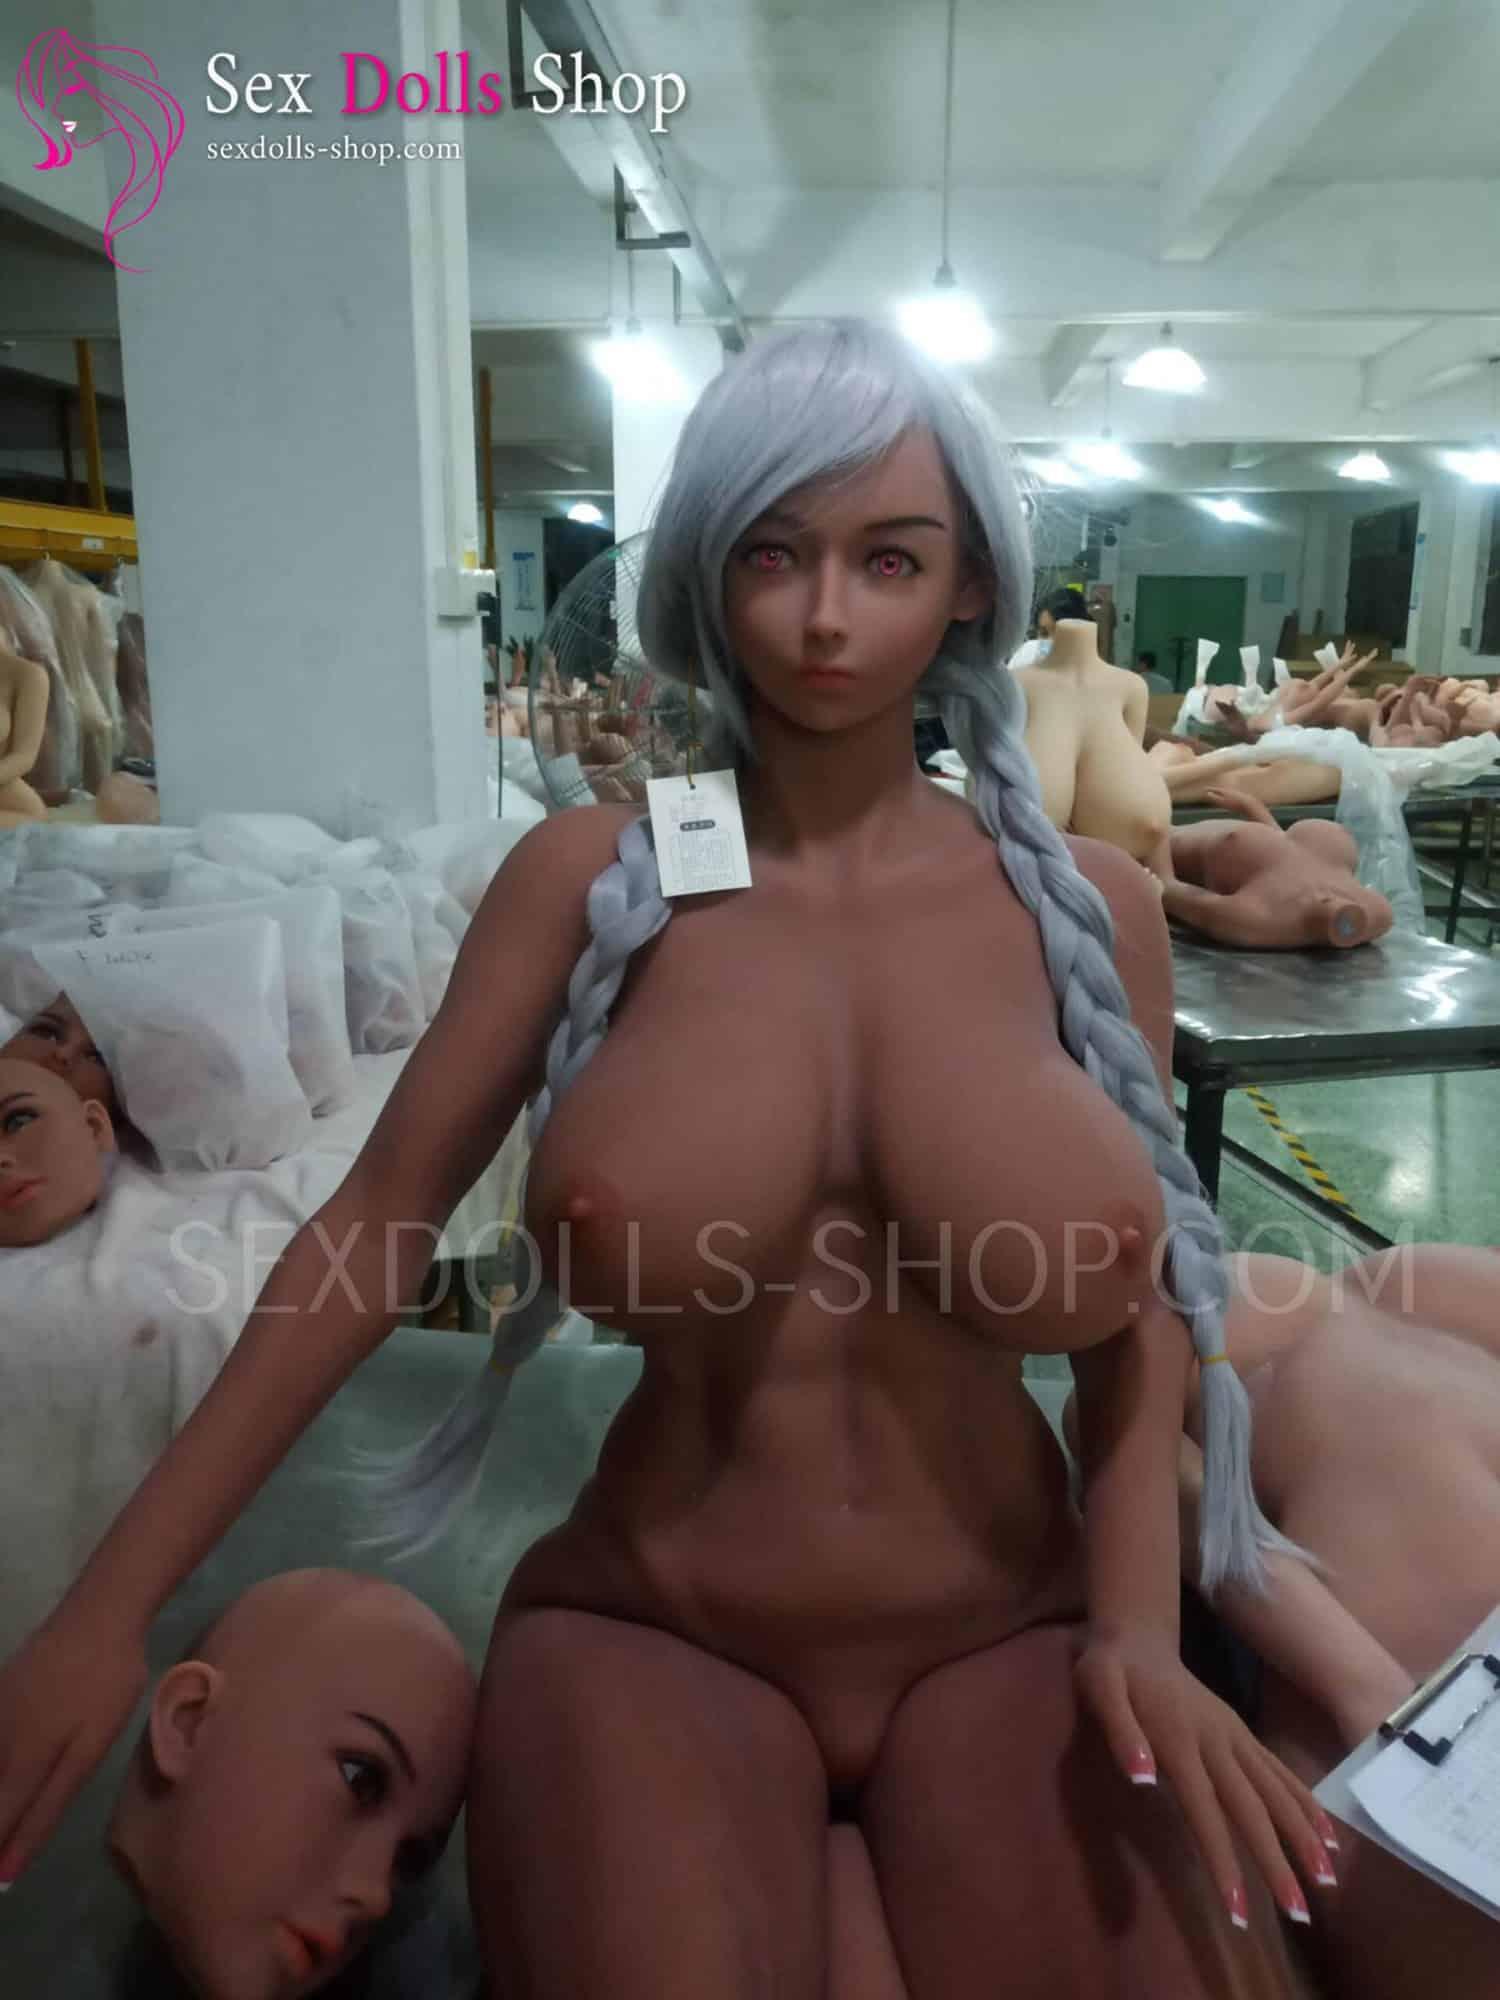 wmdoll 167cm G cup tan skin color skin color nipples head 153